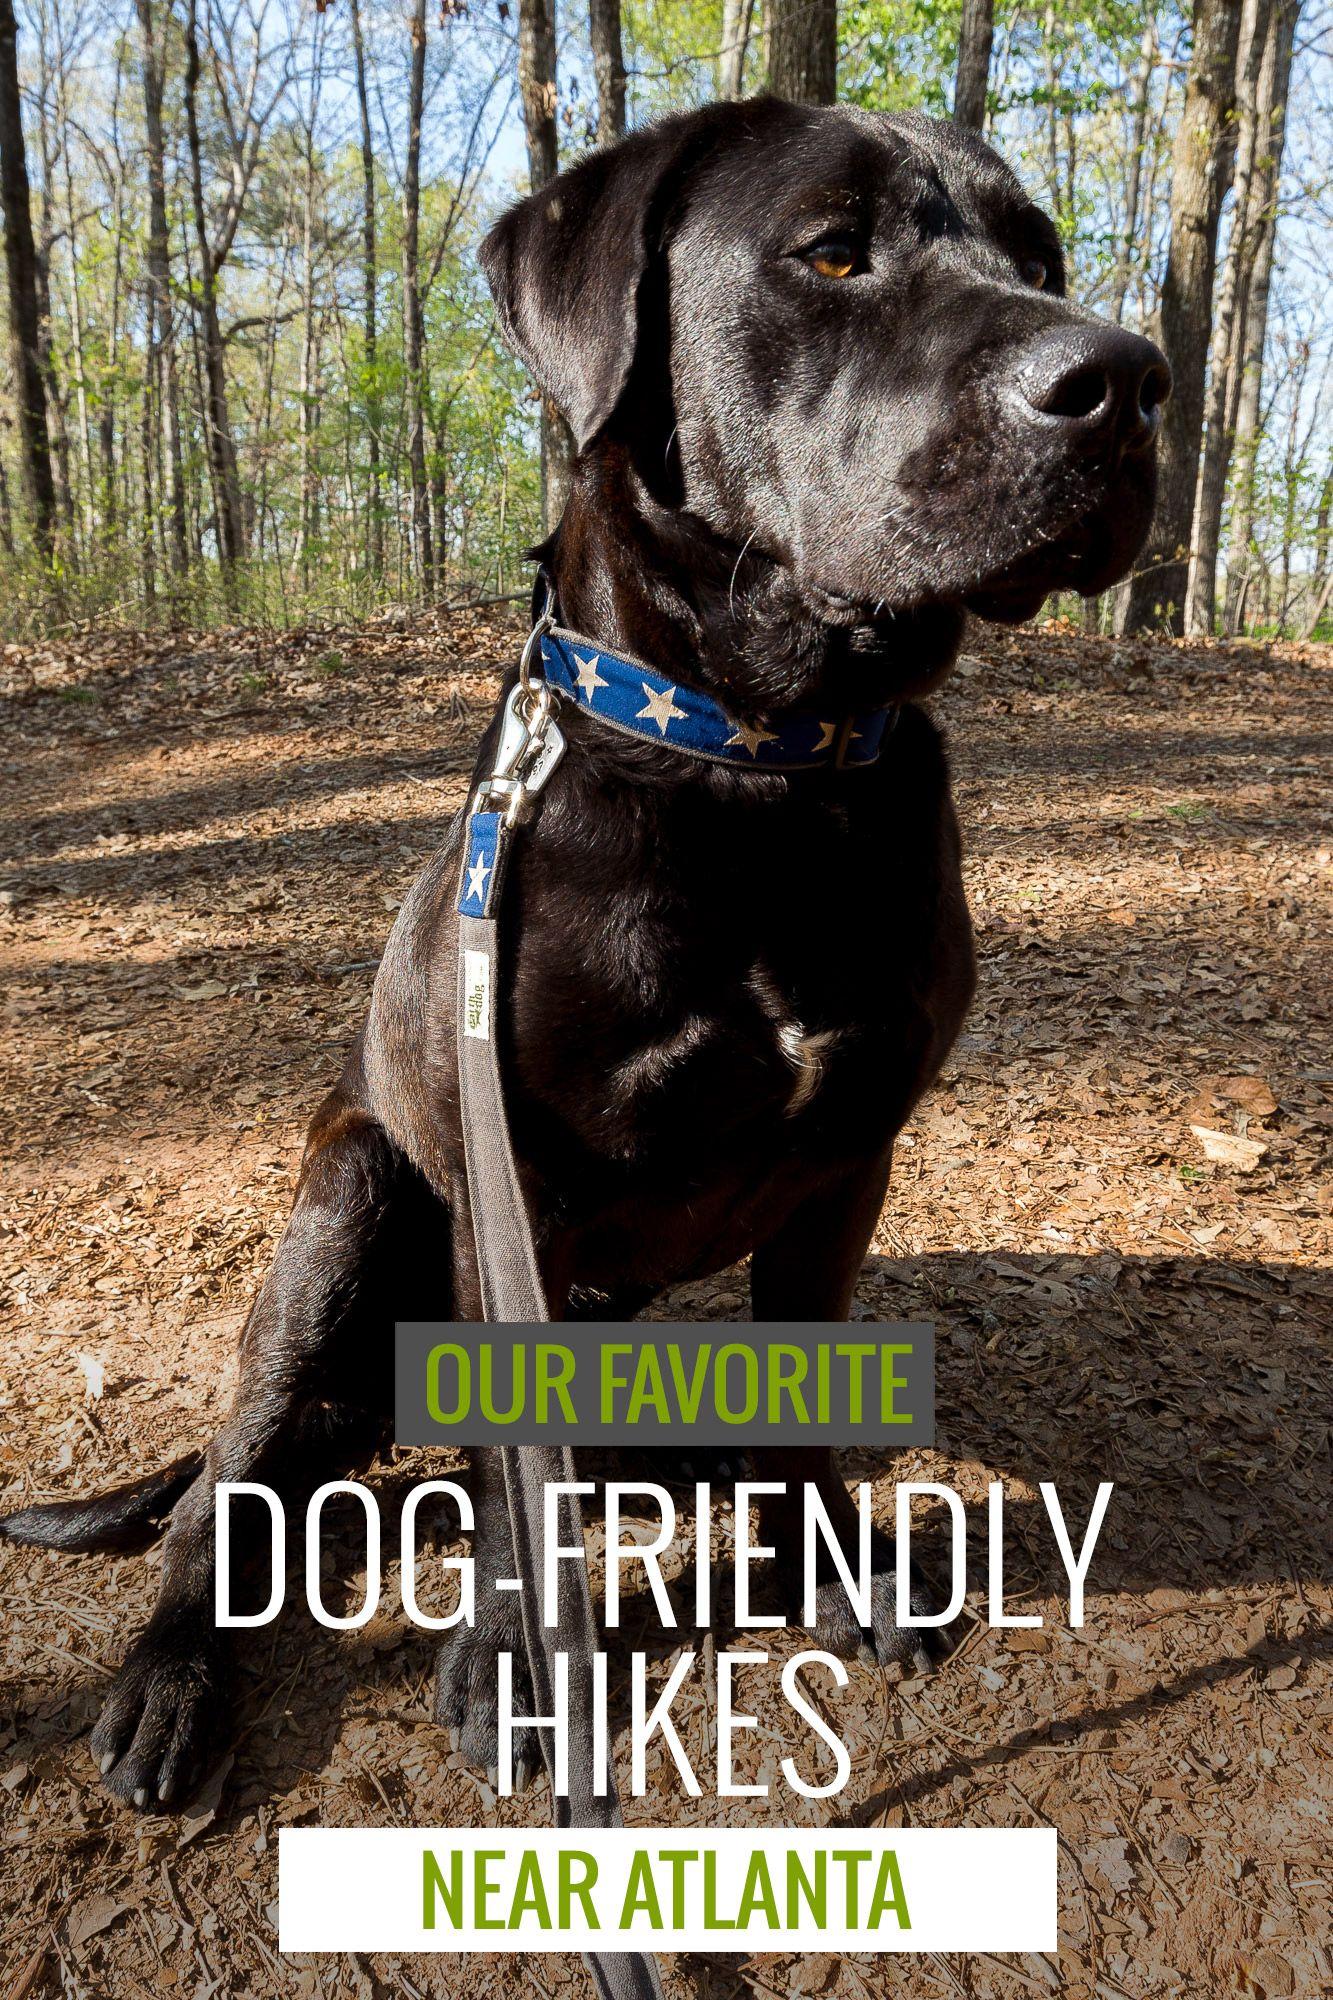 Atlantau0027s best dog-friendly trails our top 10 favorite dog-friendly hikes & Atlantau0027s best dog-friendly trails: our top 10 favorite dog ...